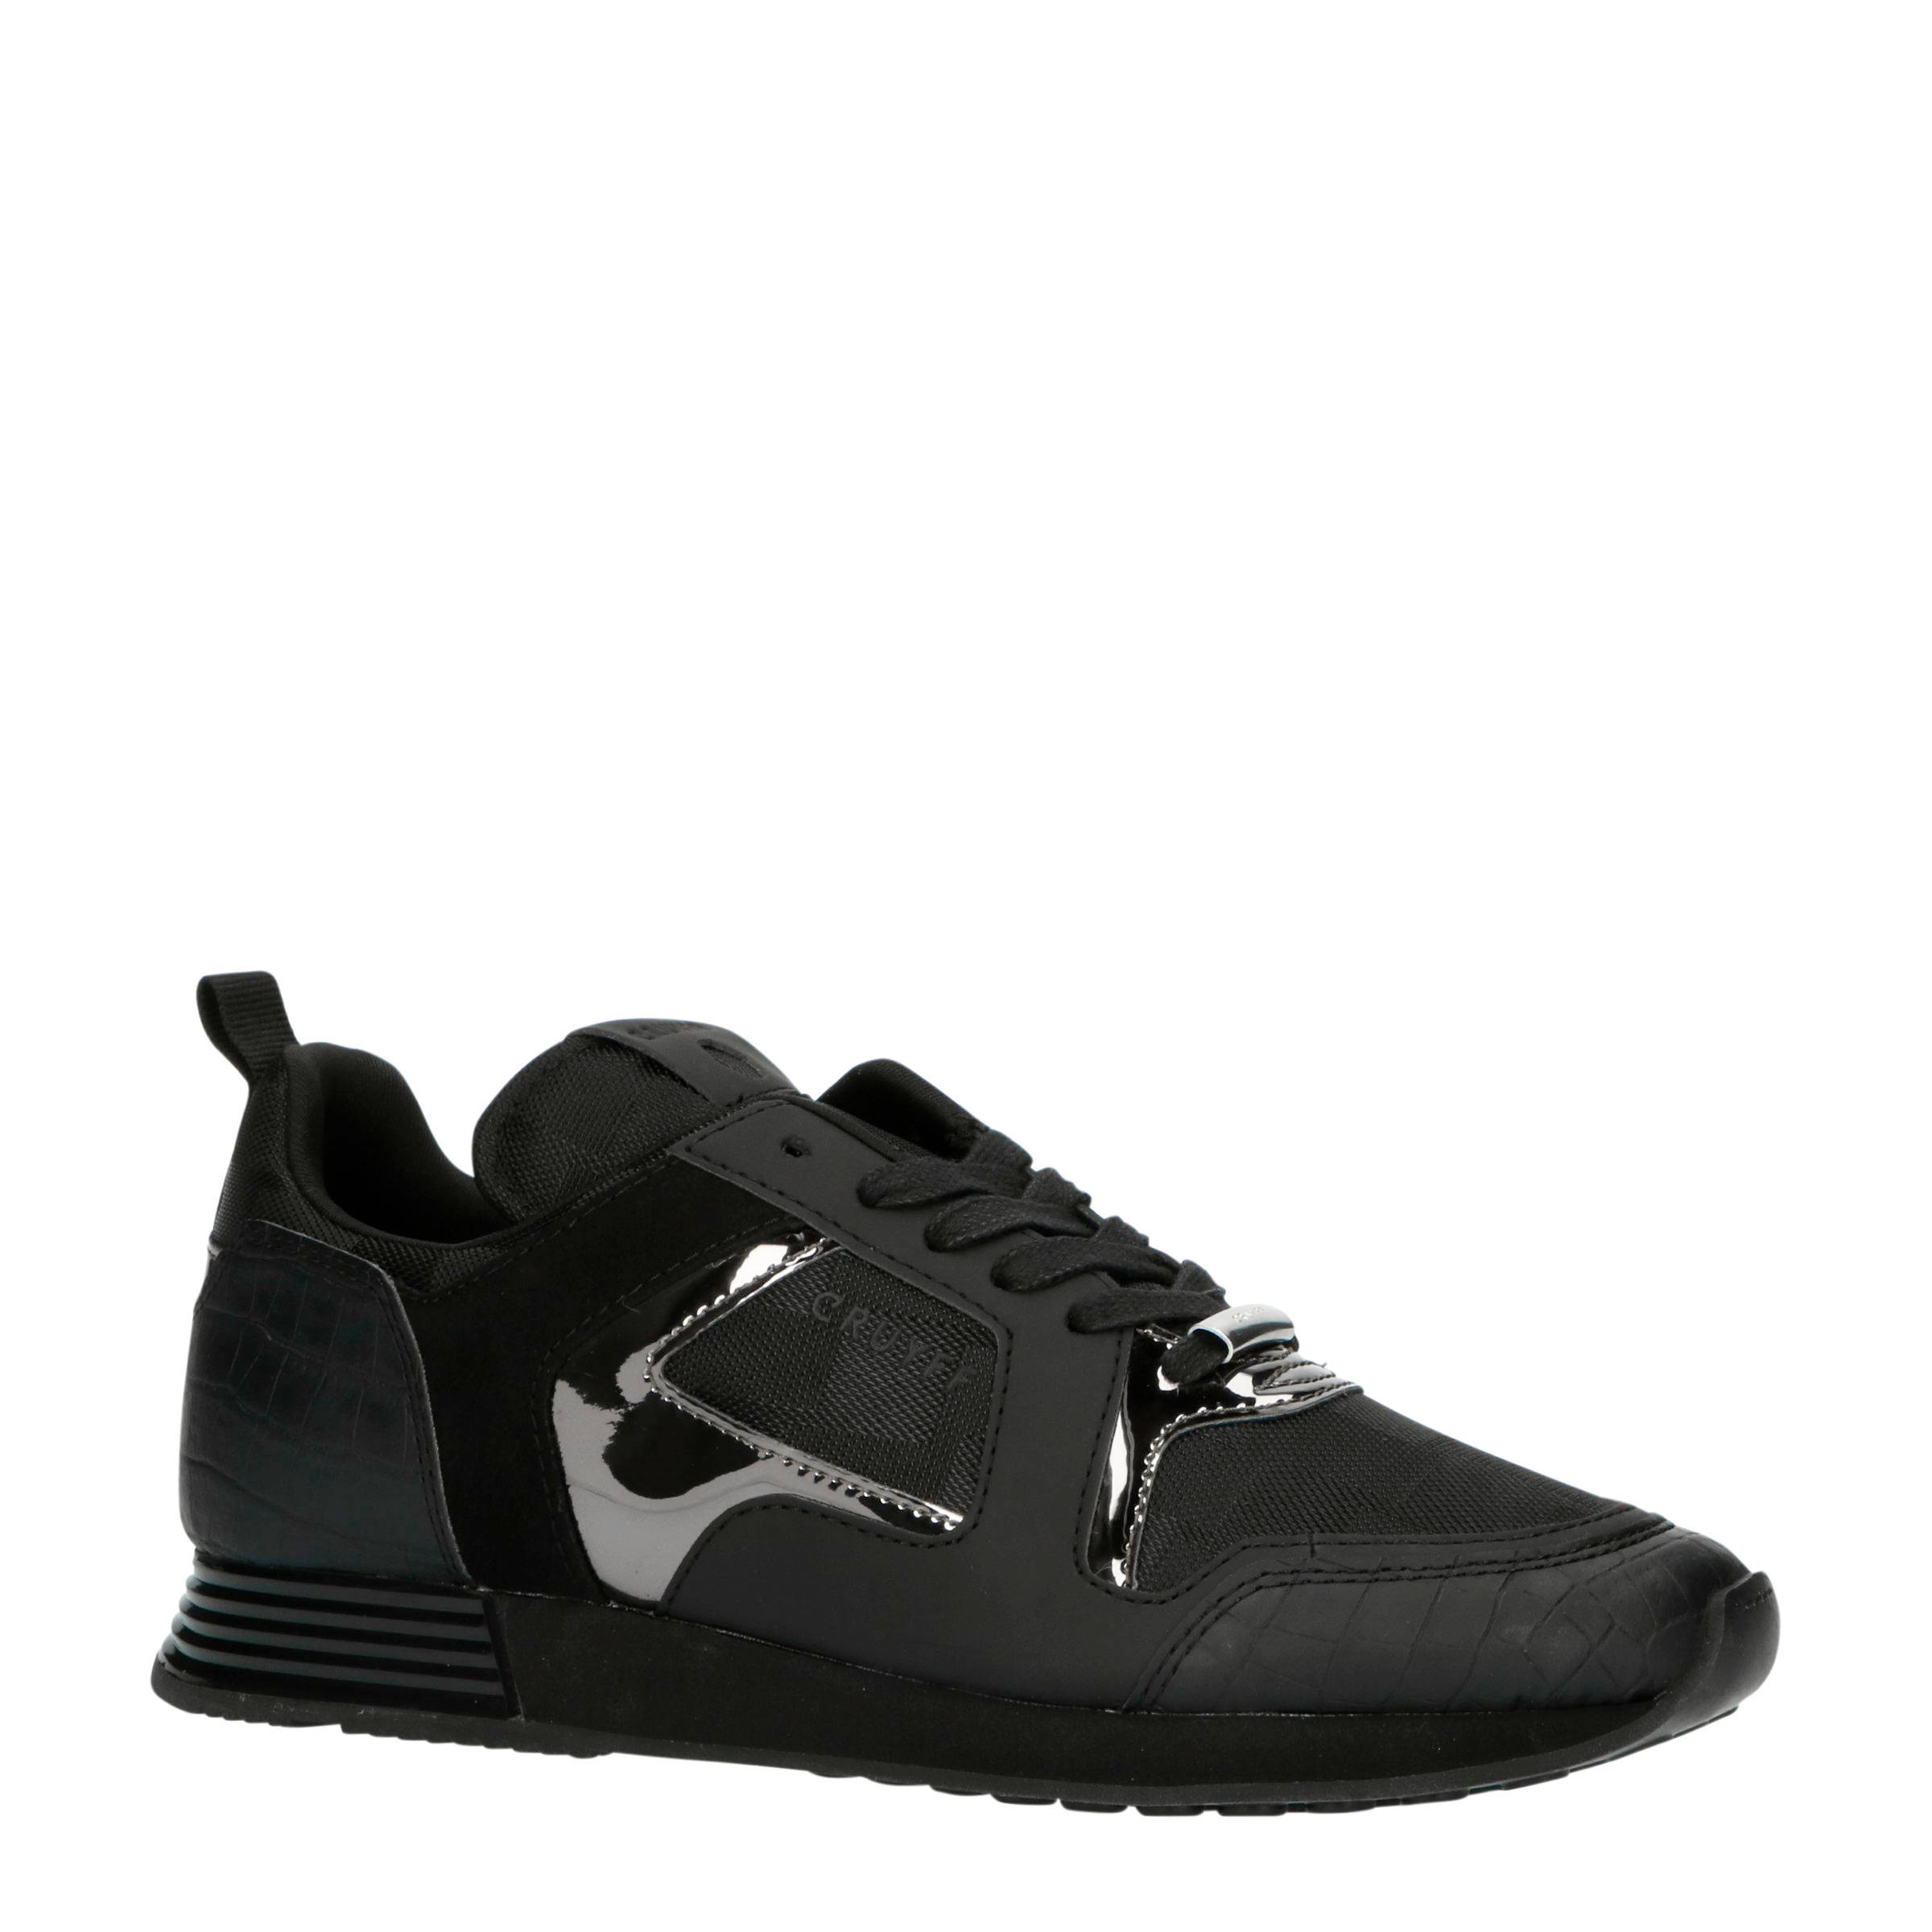 first rate 2919b 556c1 cruyff-lusso-sneakers-zwart-zwart-8719796204555.jpg